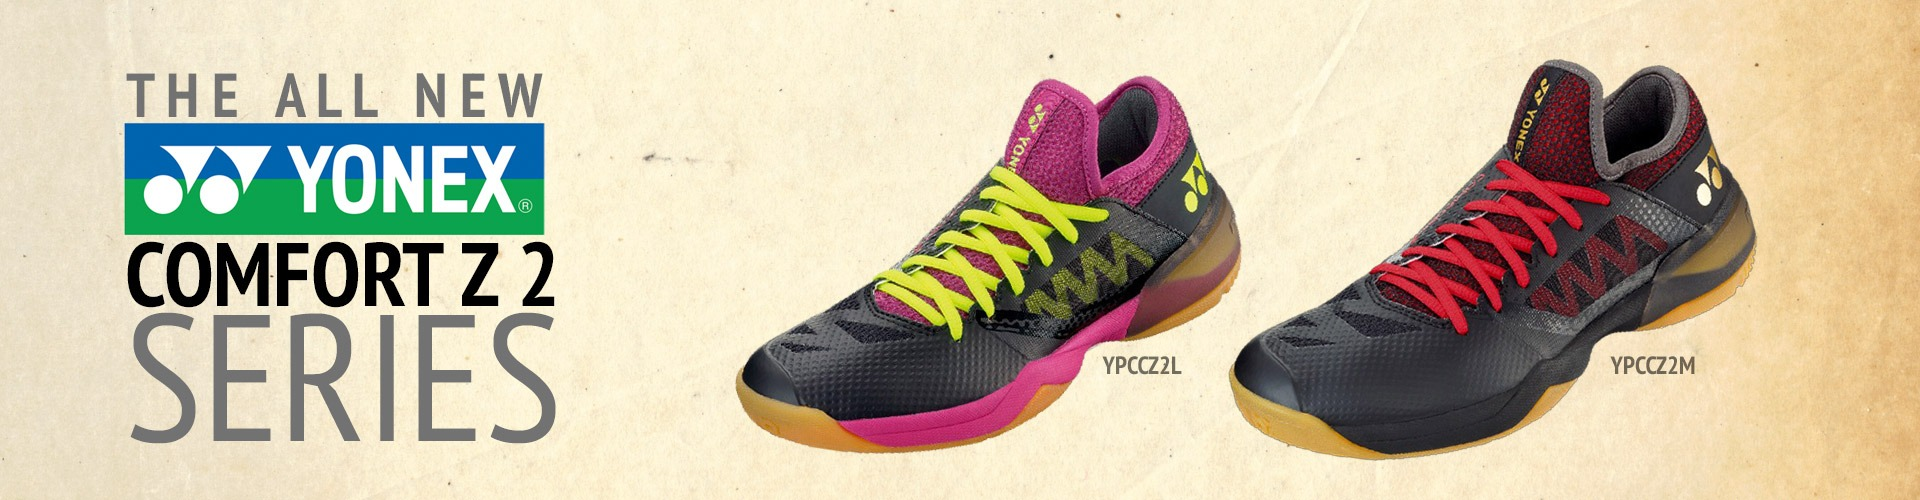 Yonex Comfort Z 2 Series